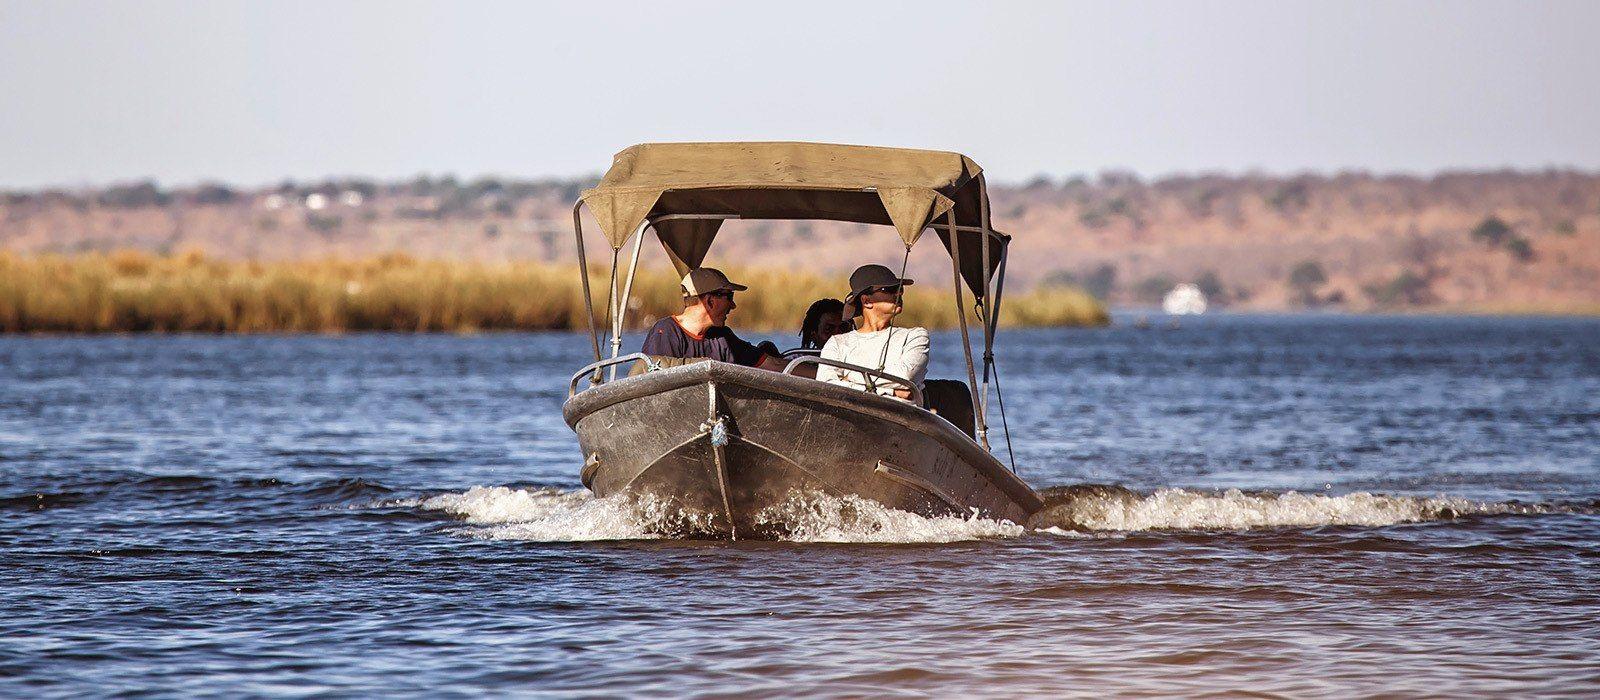 Botswana: Your Wildest Dreams Tour Trip 3